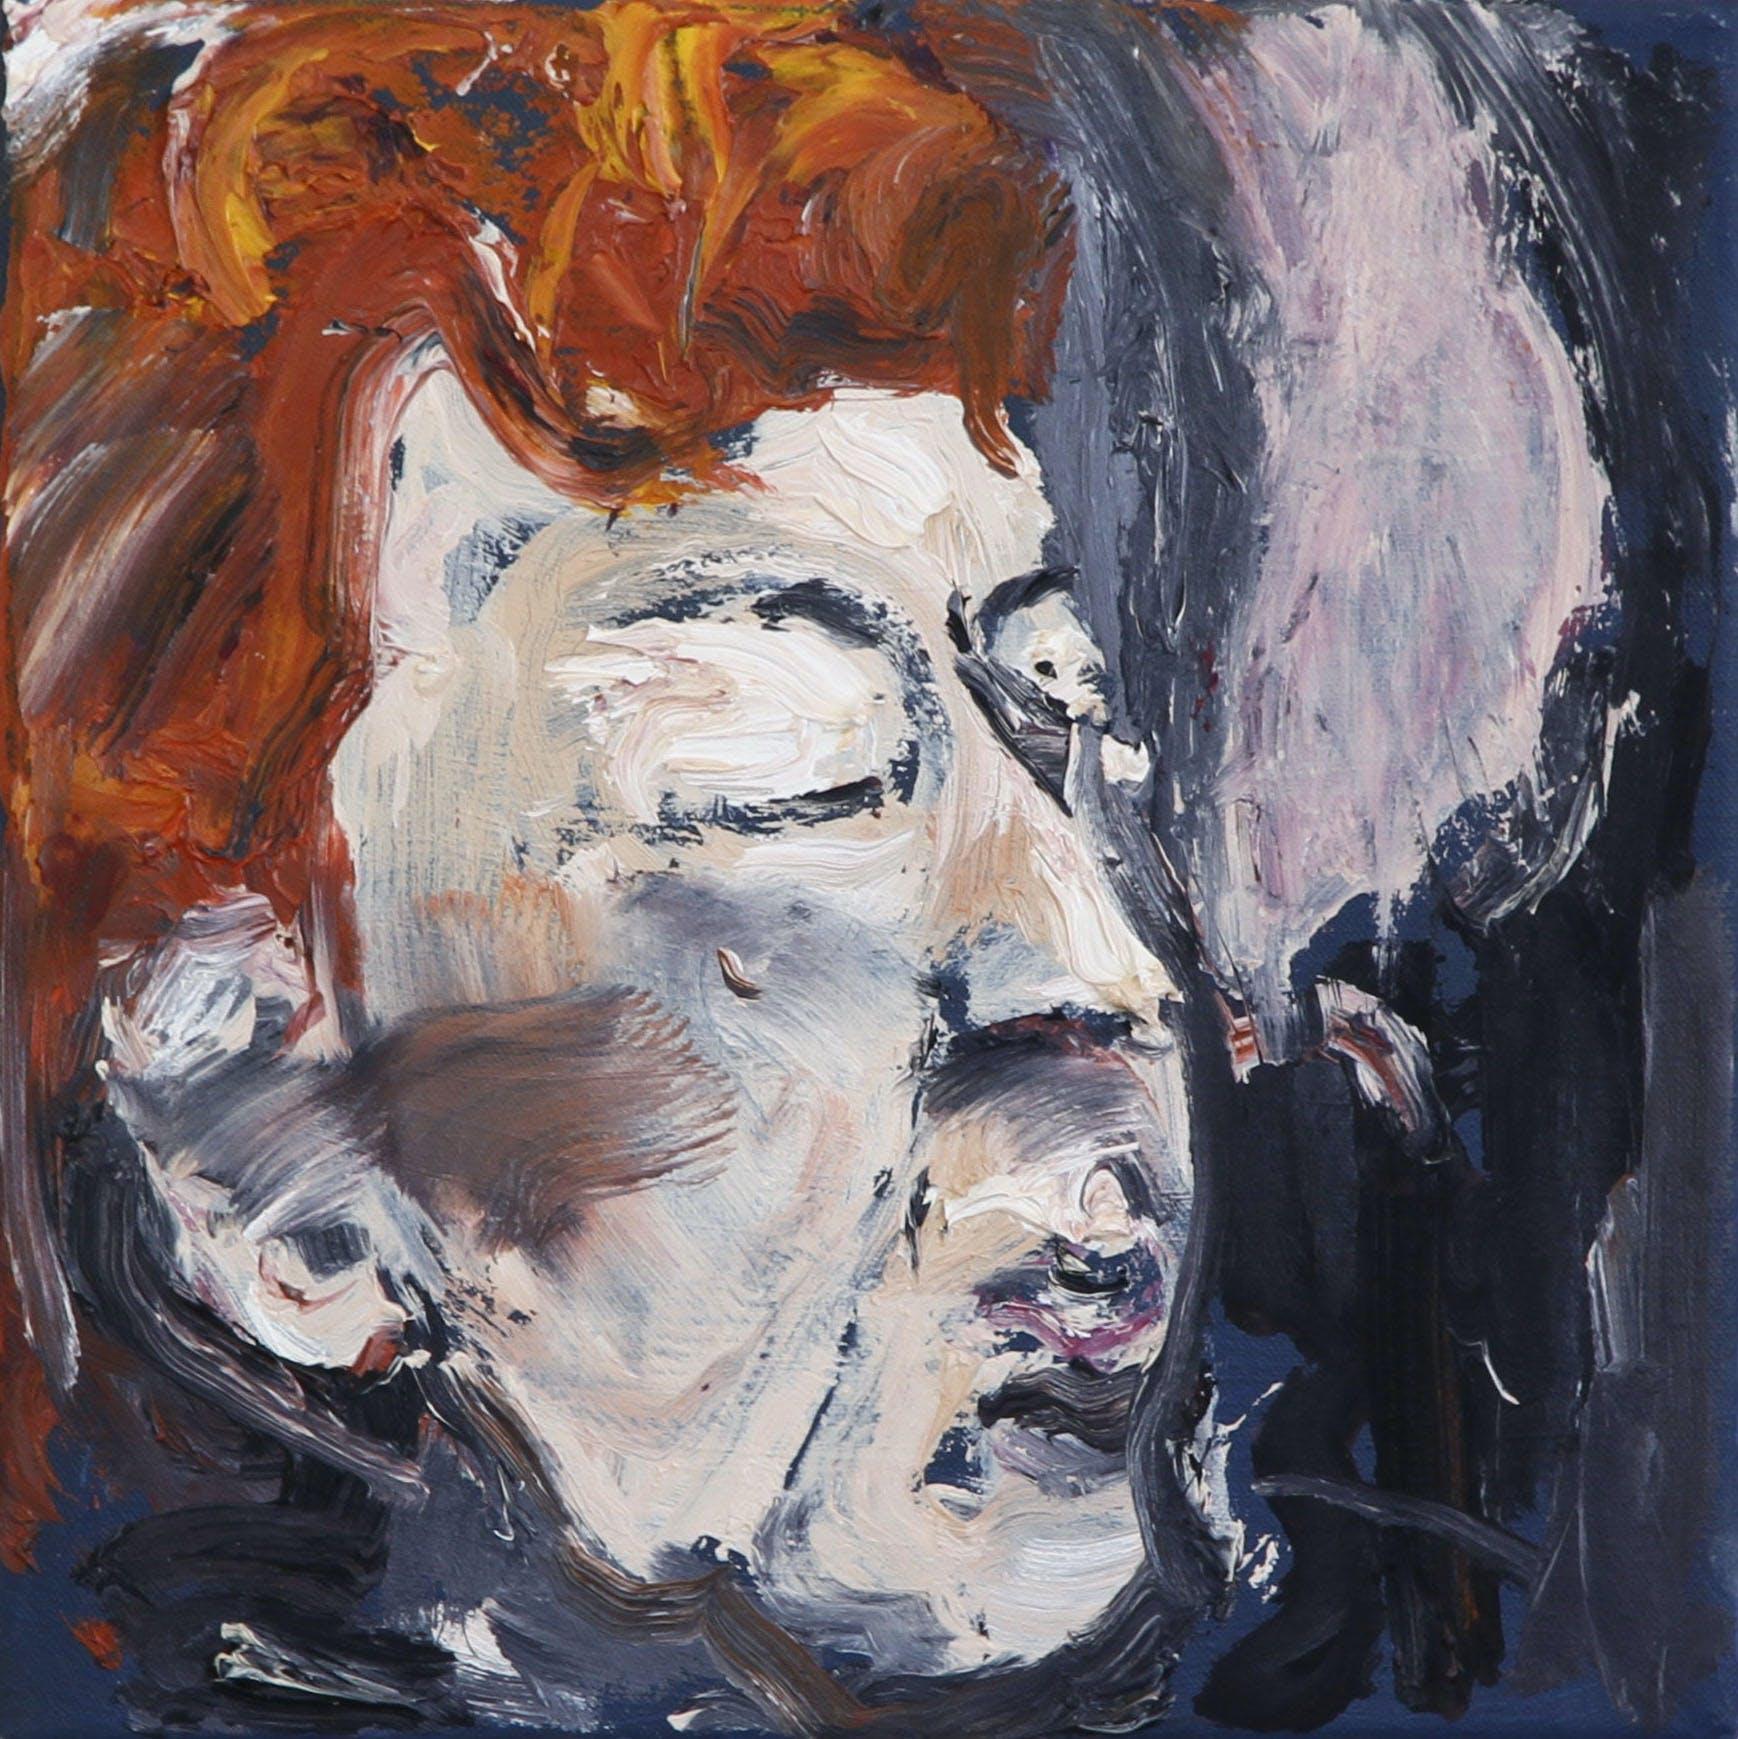 Claire, 20cm x 20cm, öljy kankaalle, 2017